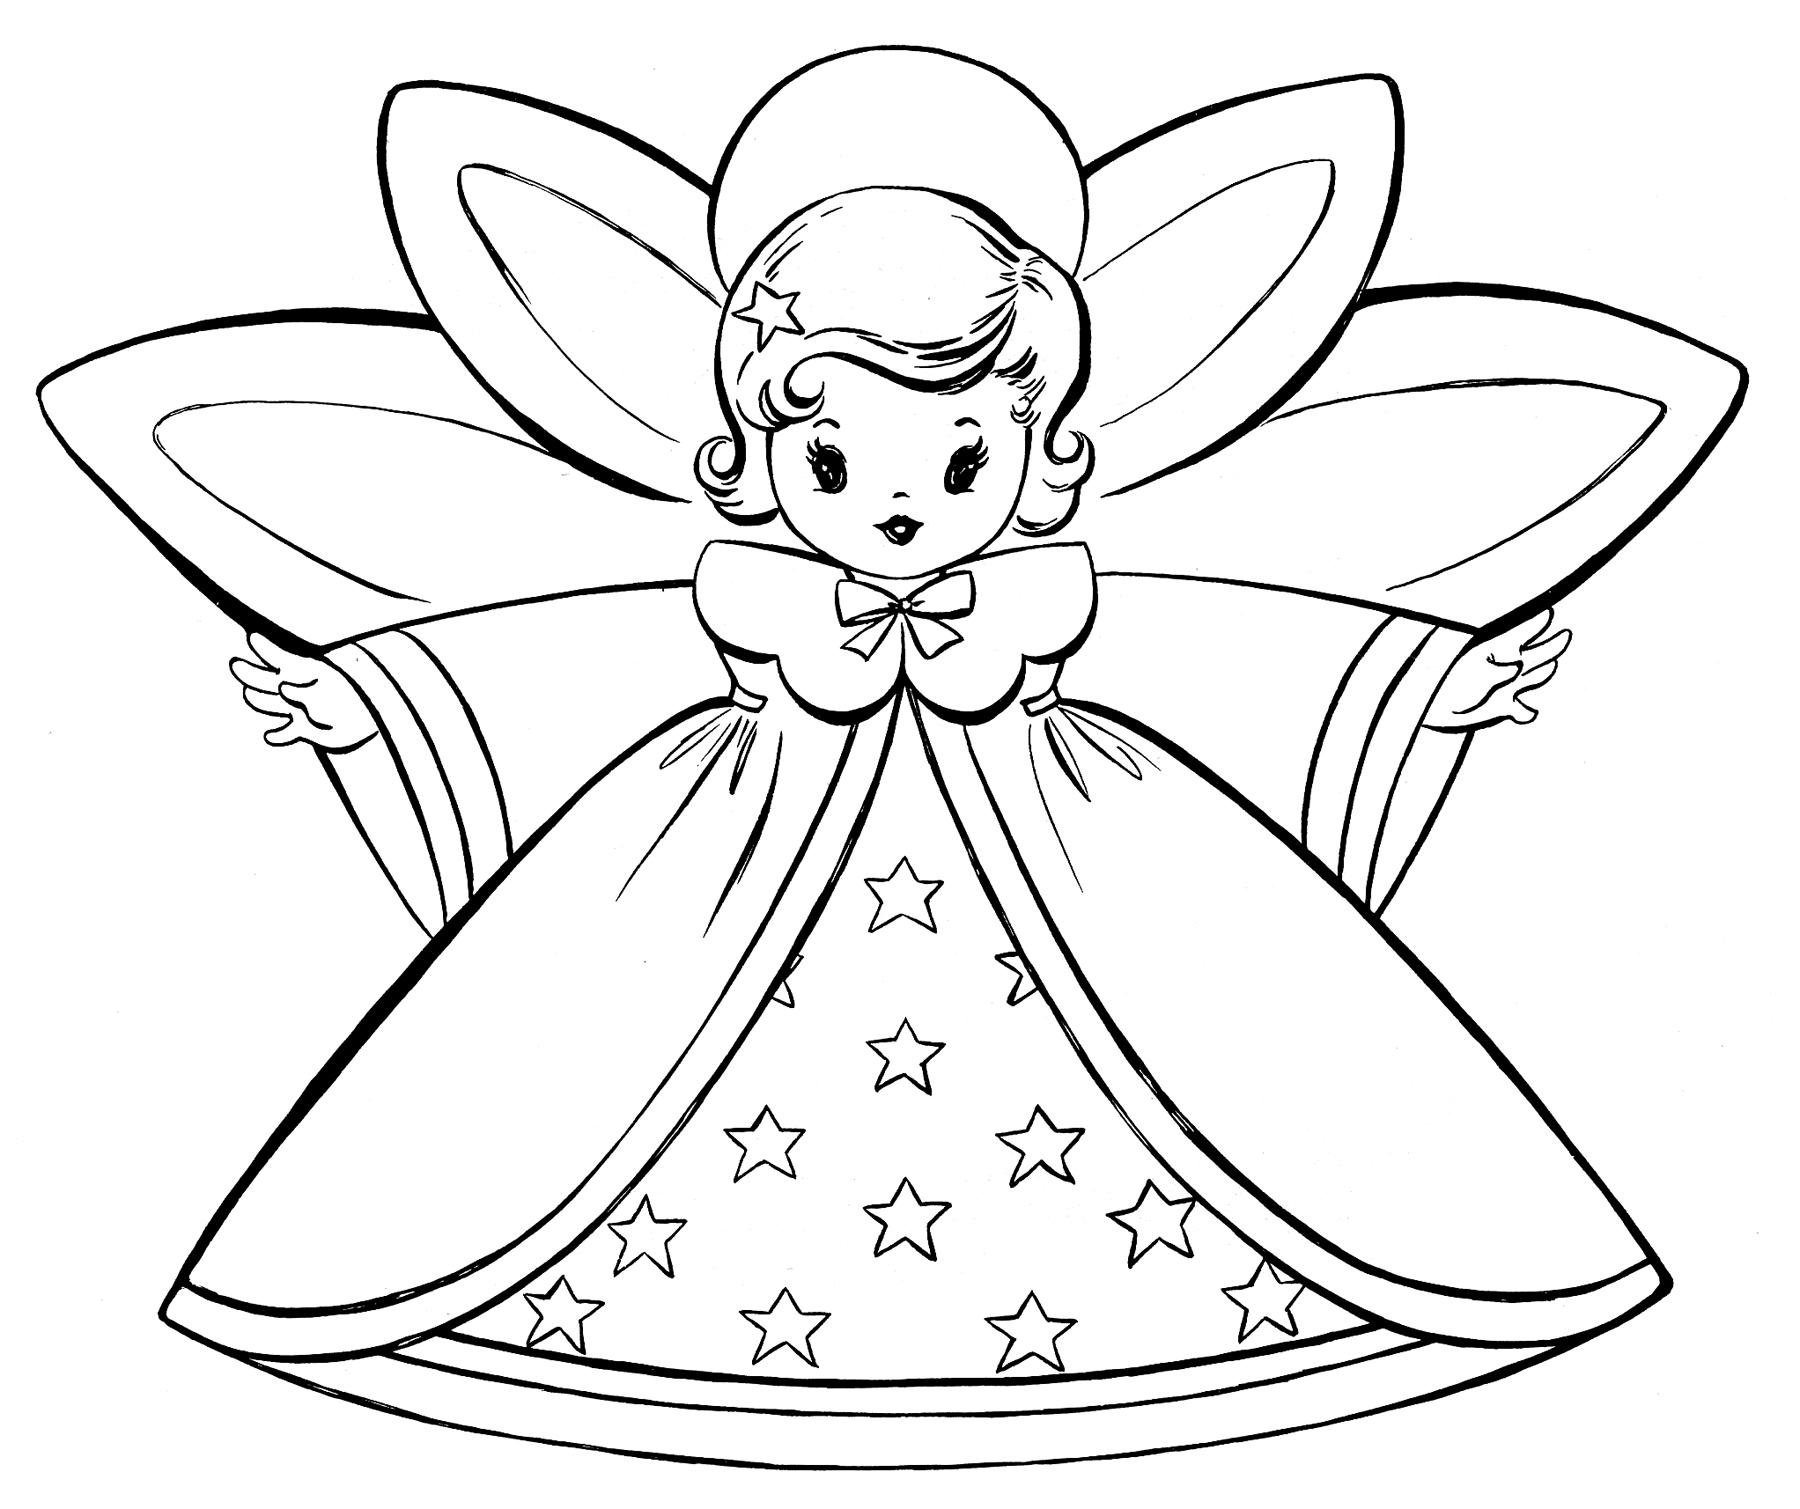 coloring xmas free christmas coloring pages retro angels the xmas coloring